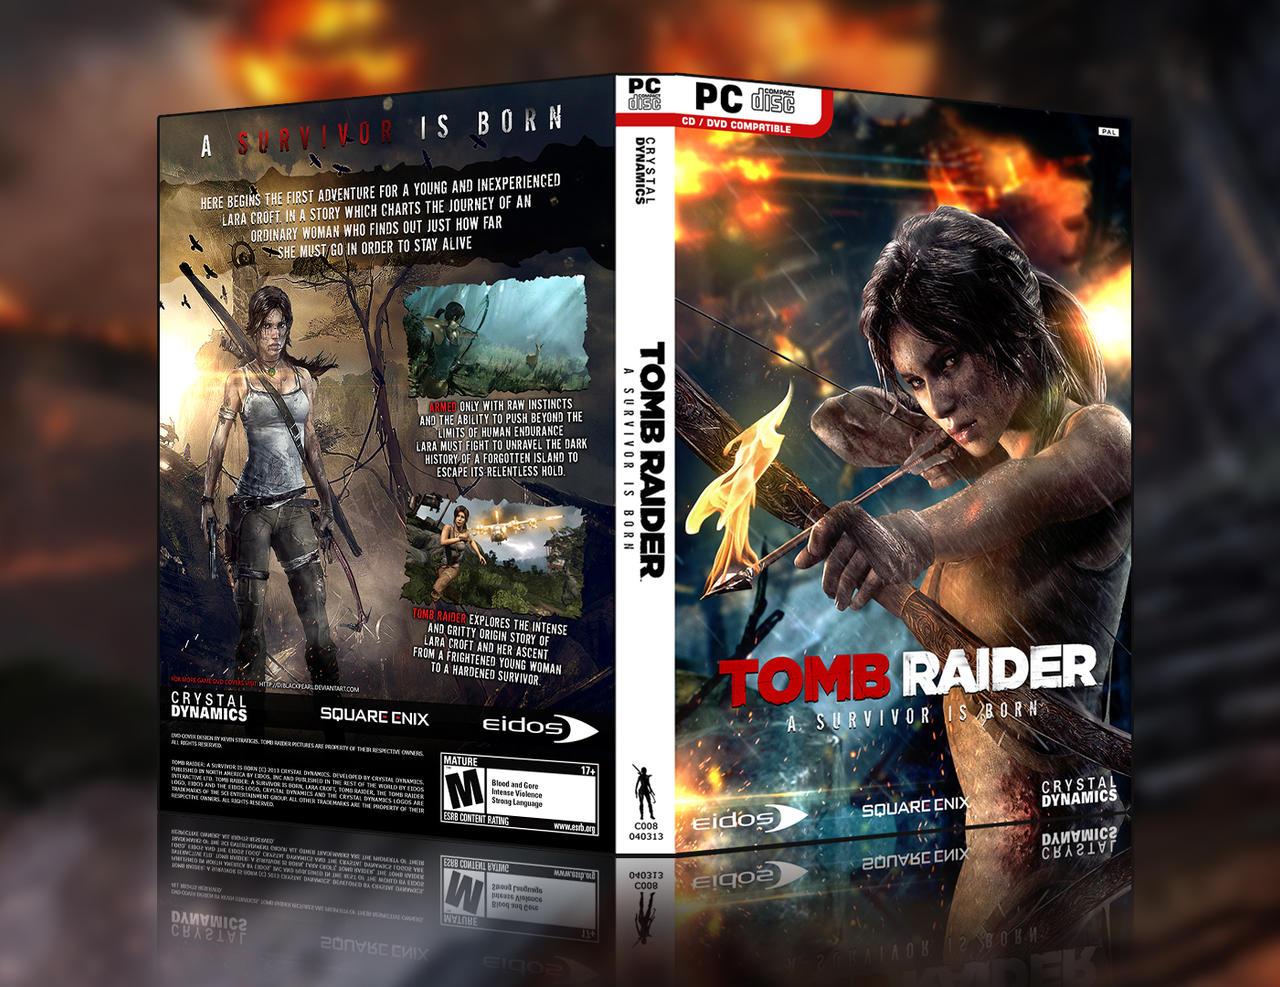 Tomb Raider: A Survivor Is Born - HD Custom Cover